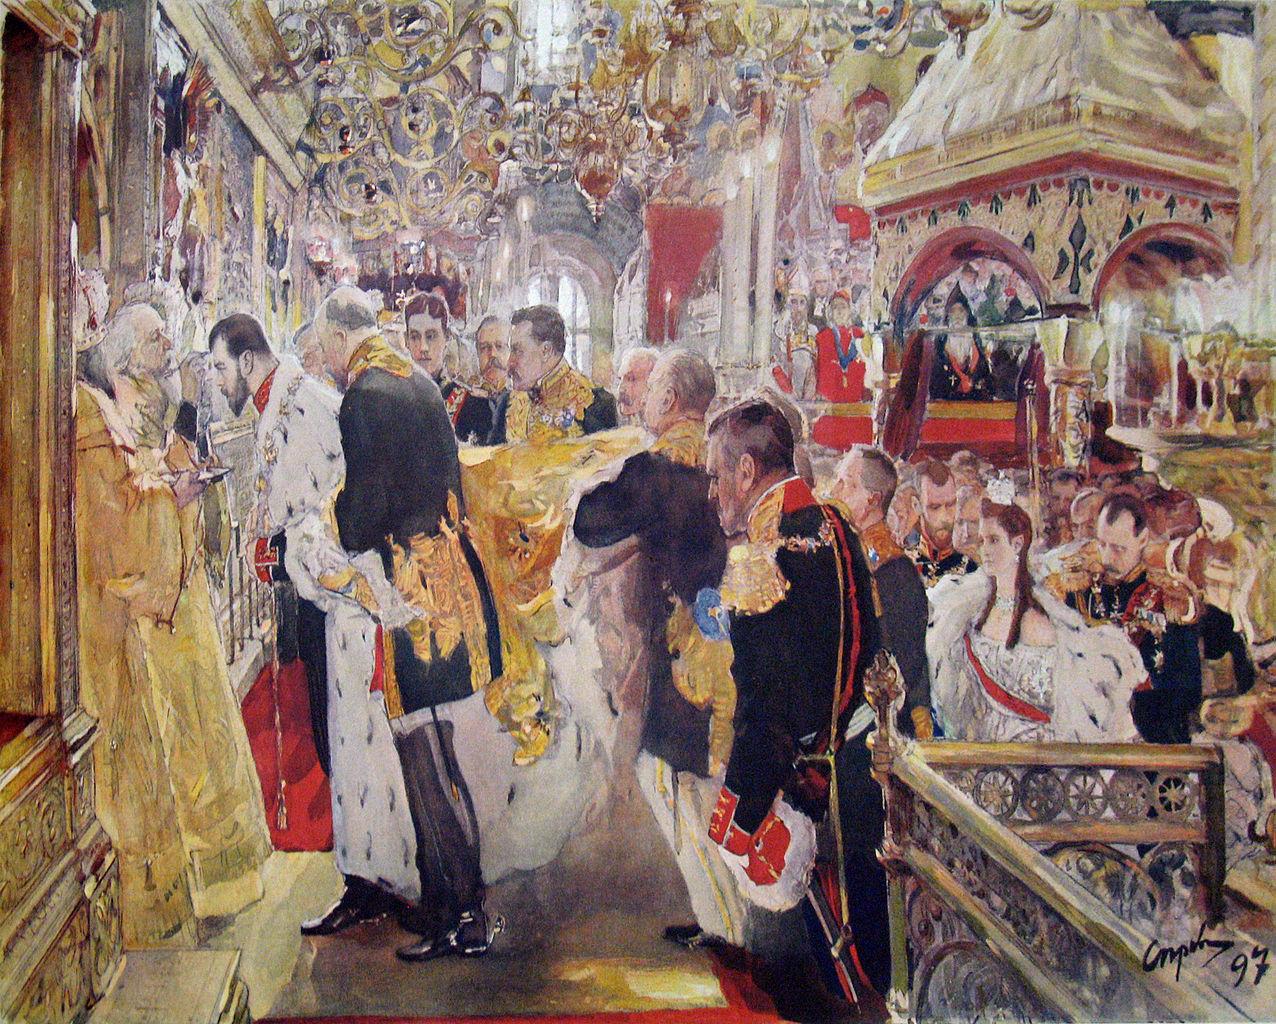 Coronation of Tsar Nicholas II of Russia by Valentin Alexandrovich Serov, 1899